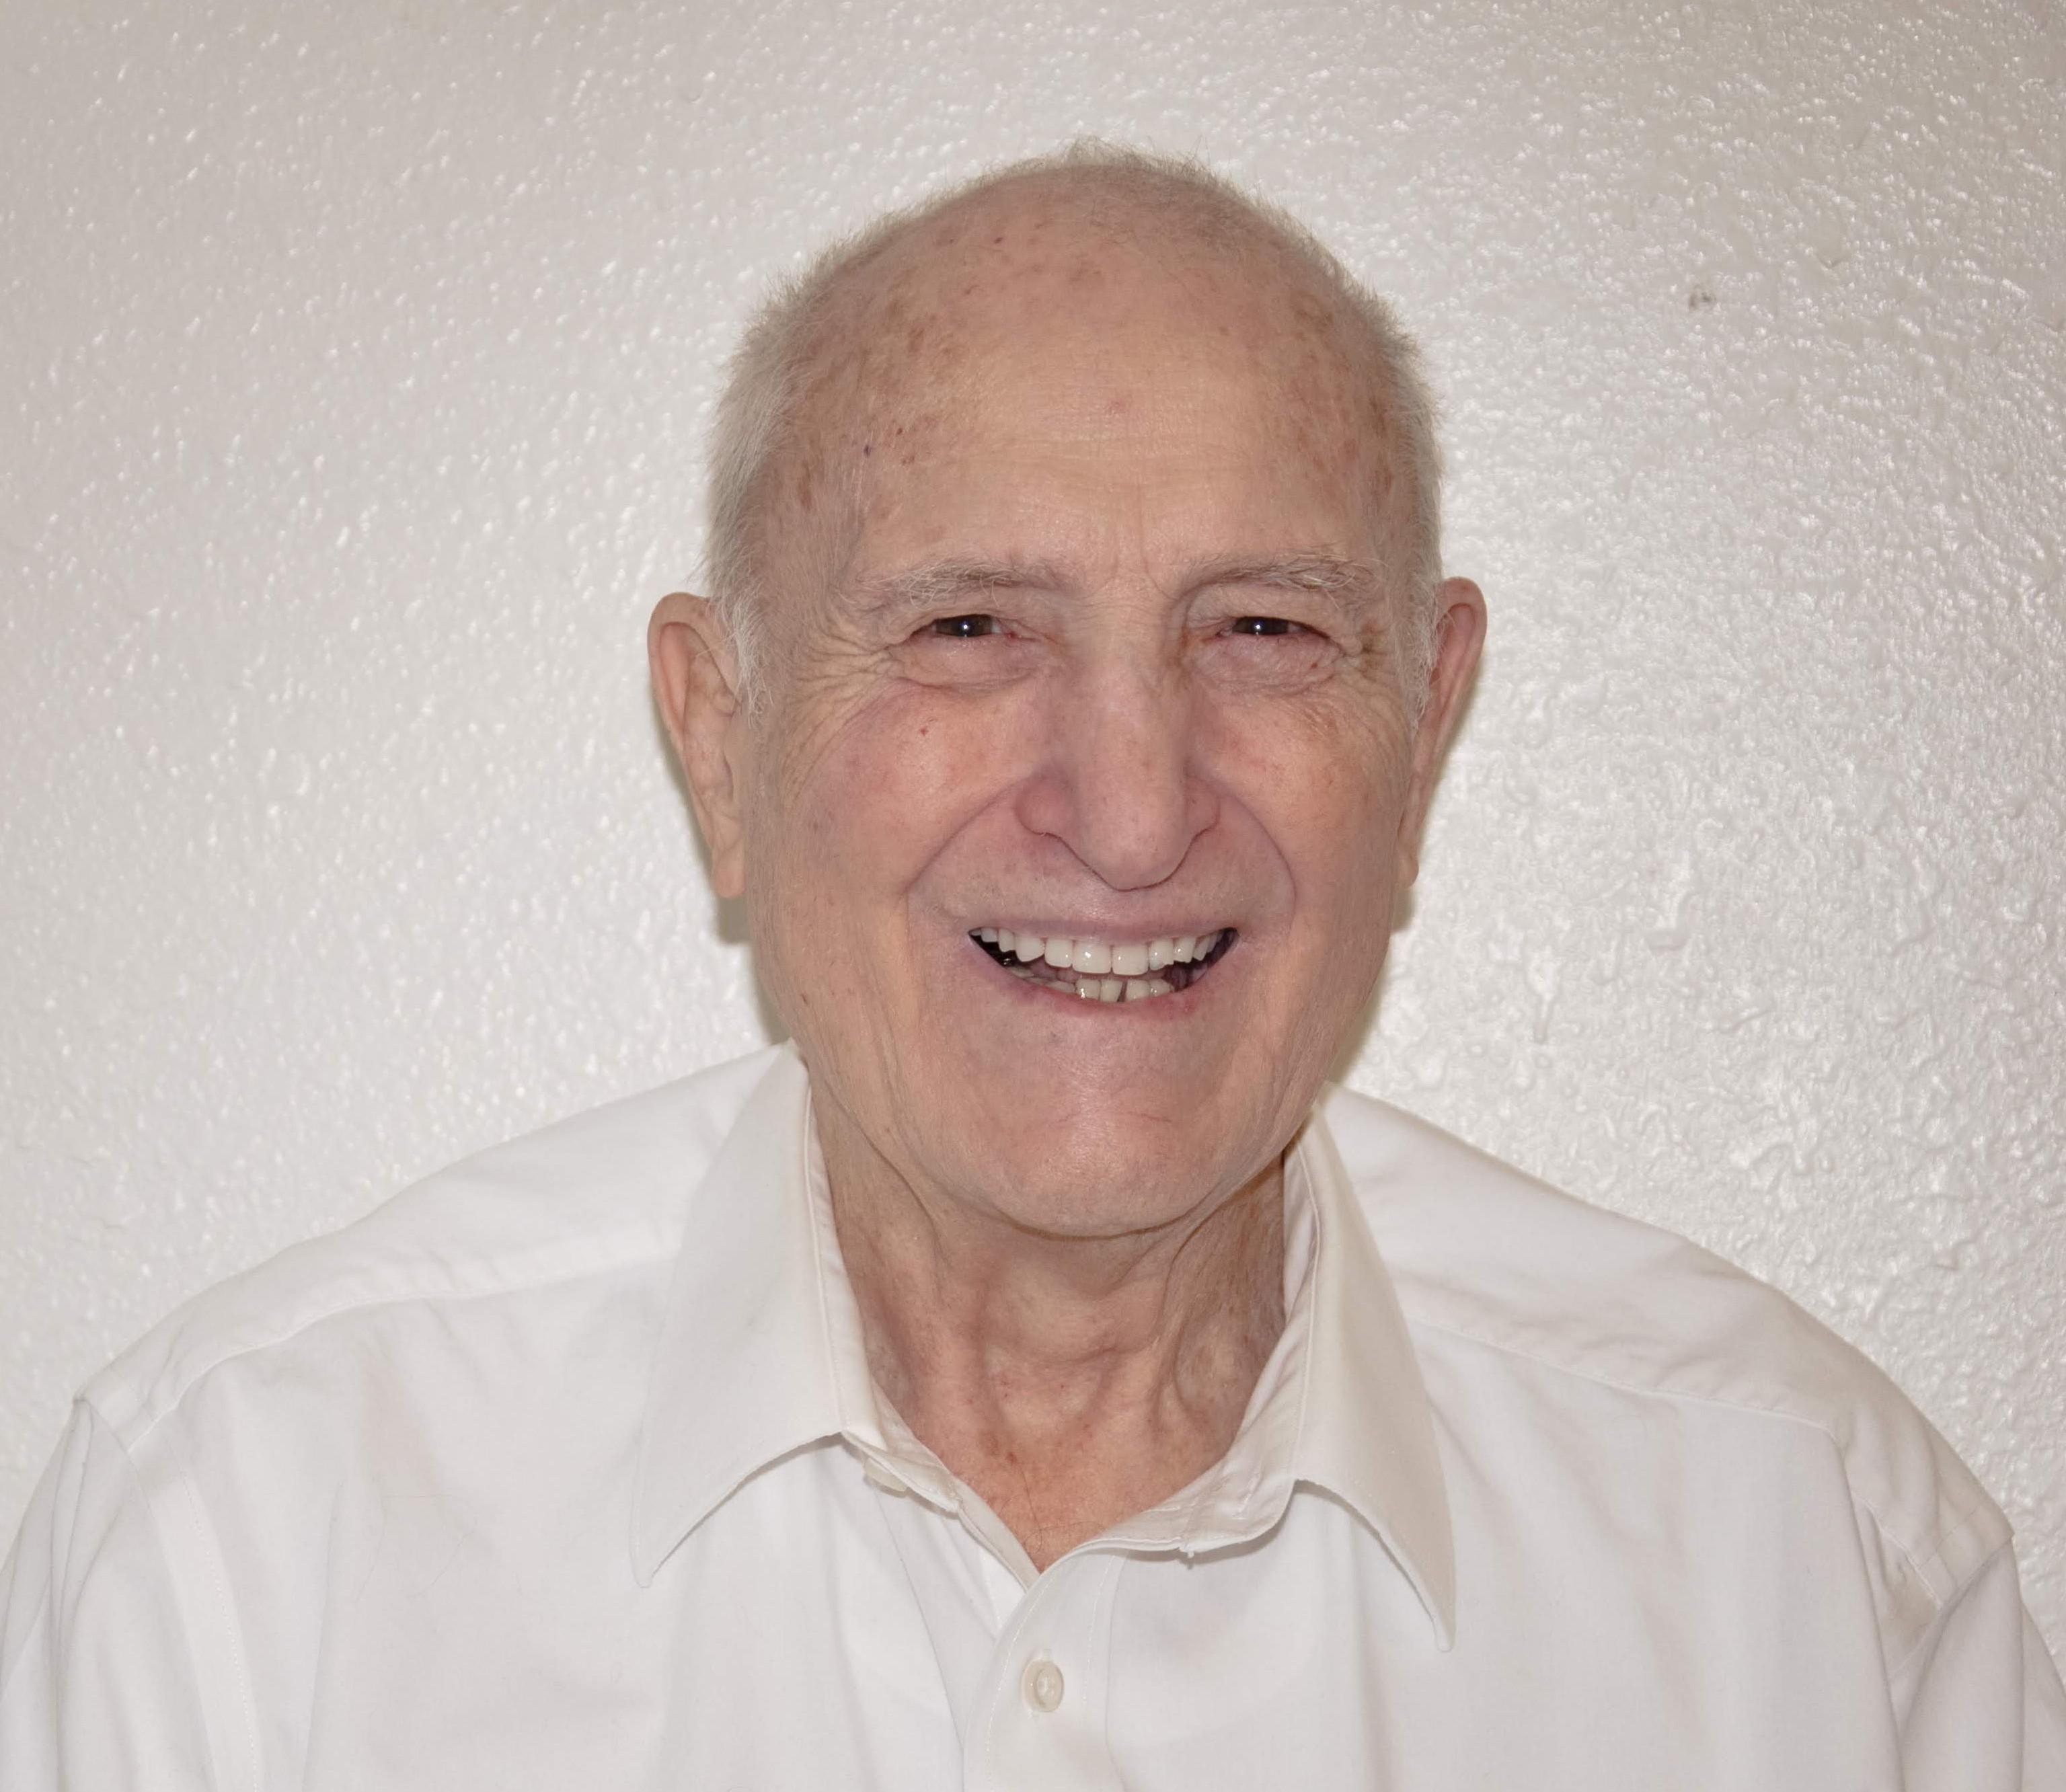 Harold Joseph Johnson